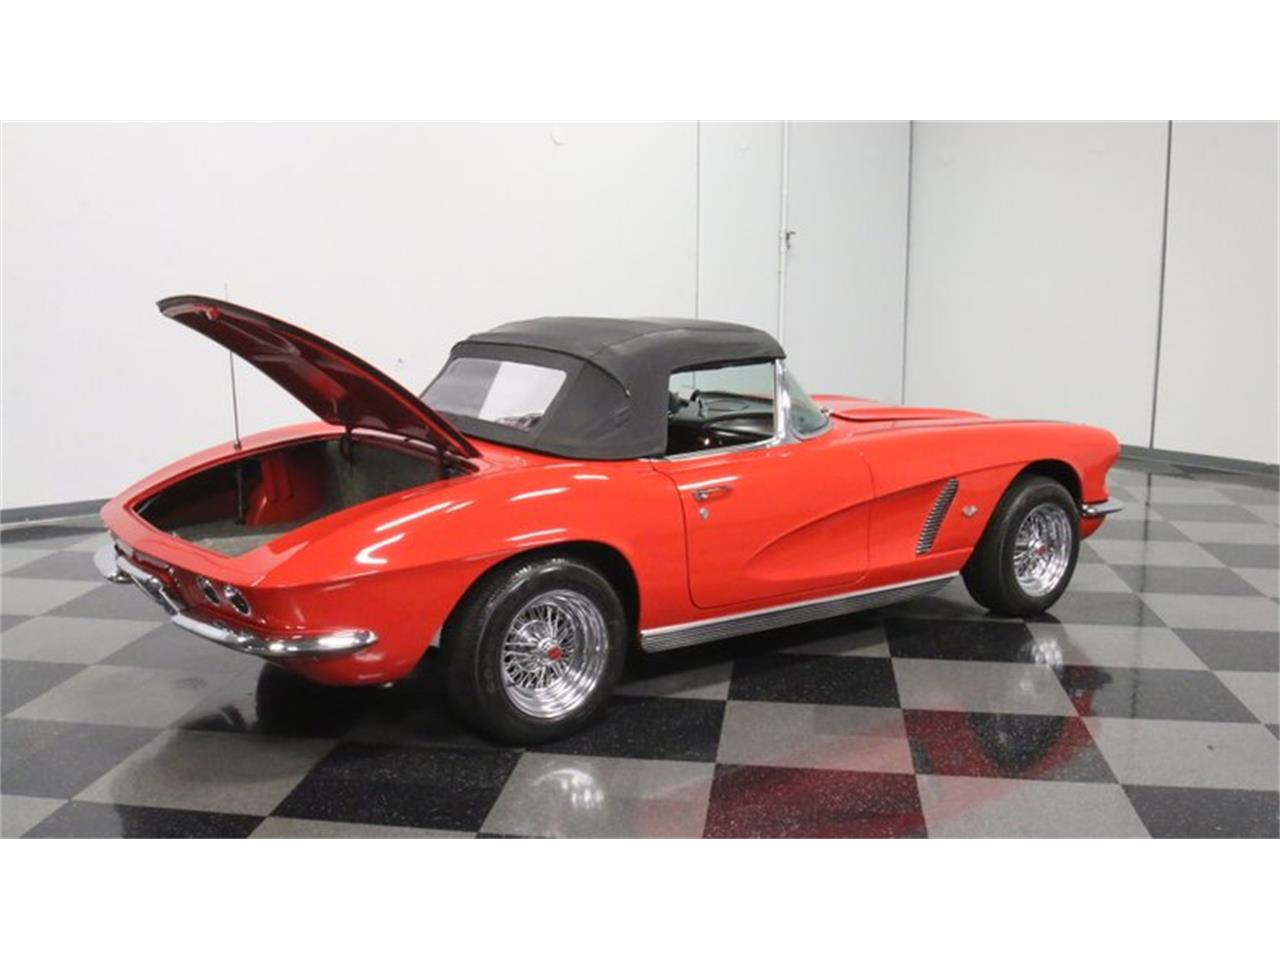 Large Picture of '62 Corvette located in Lithia Springs Georgia - $60,995.00 - Q72N